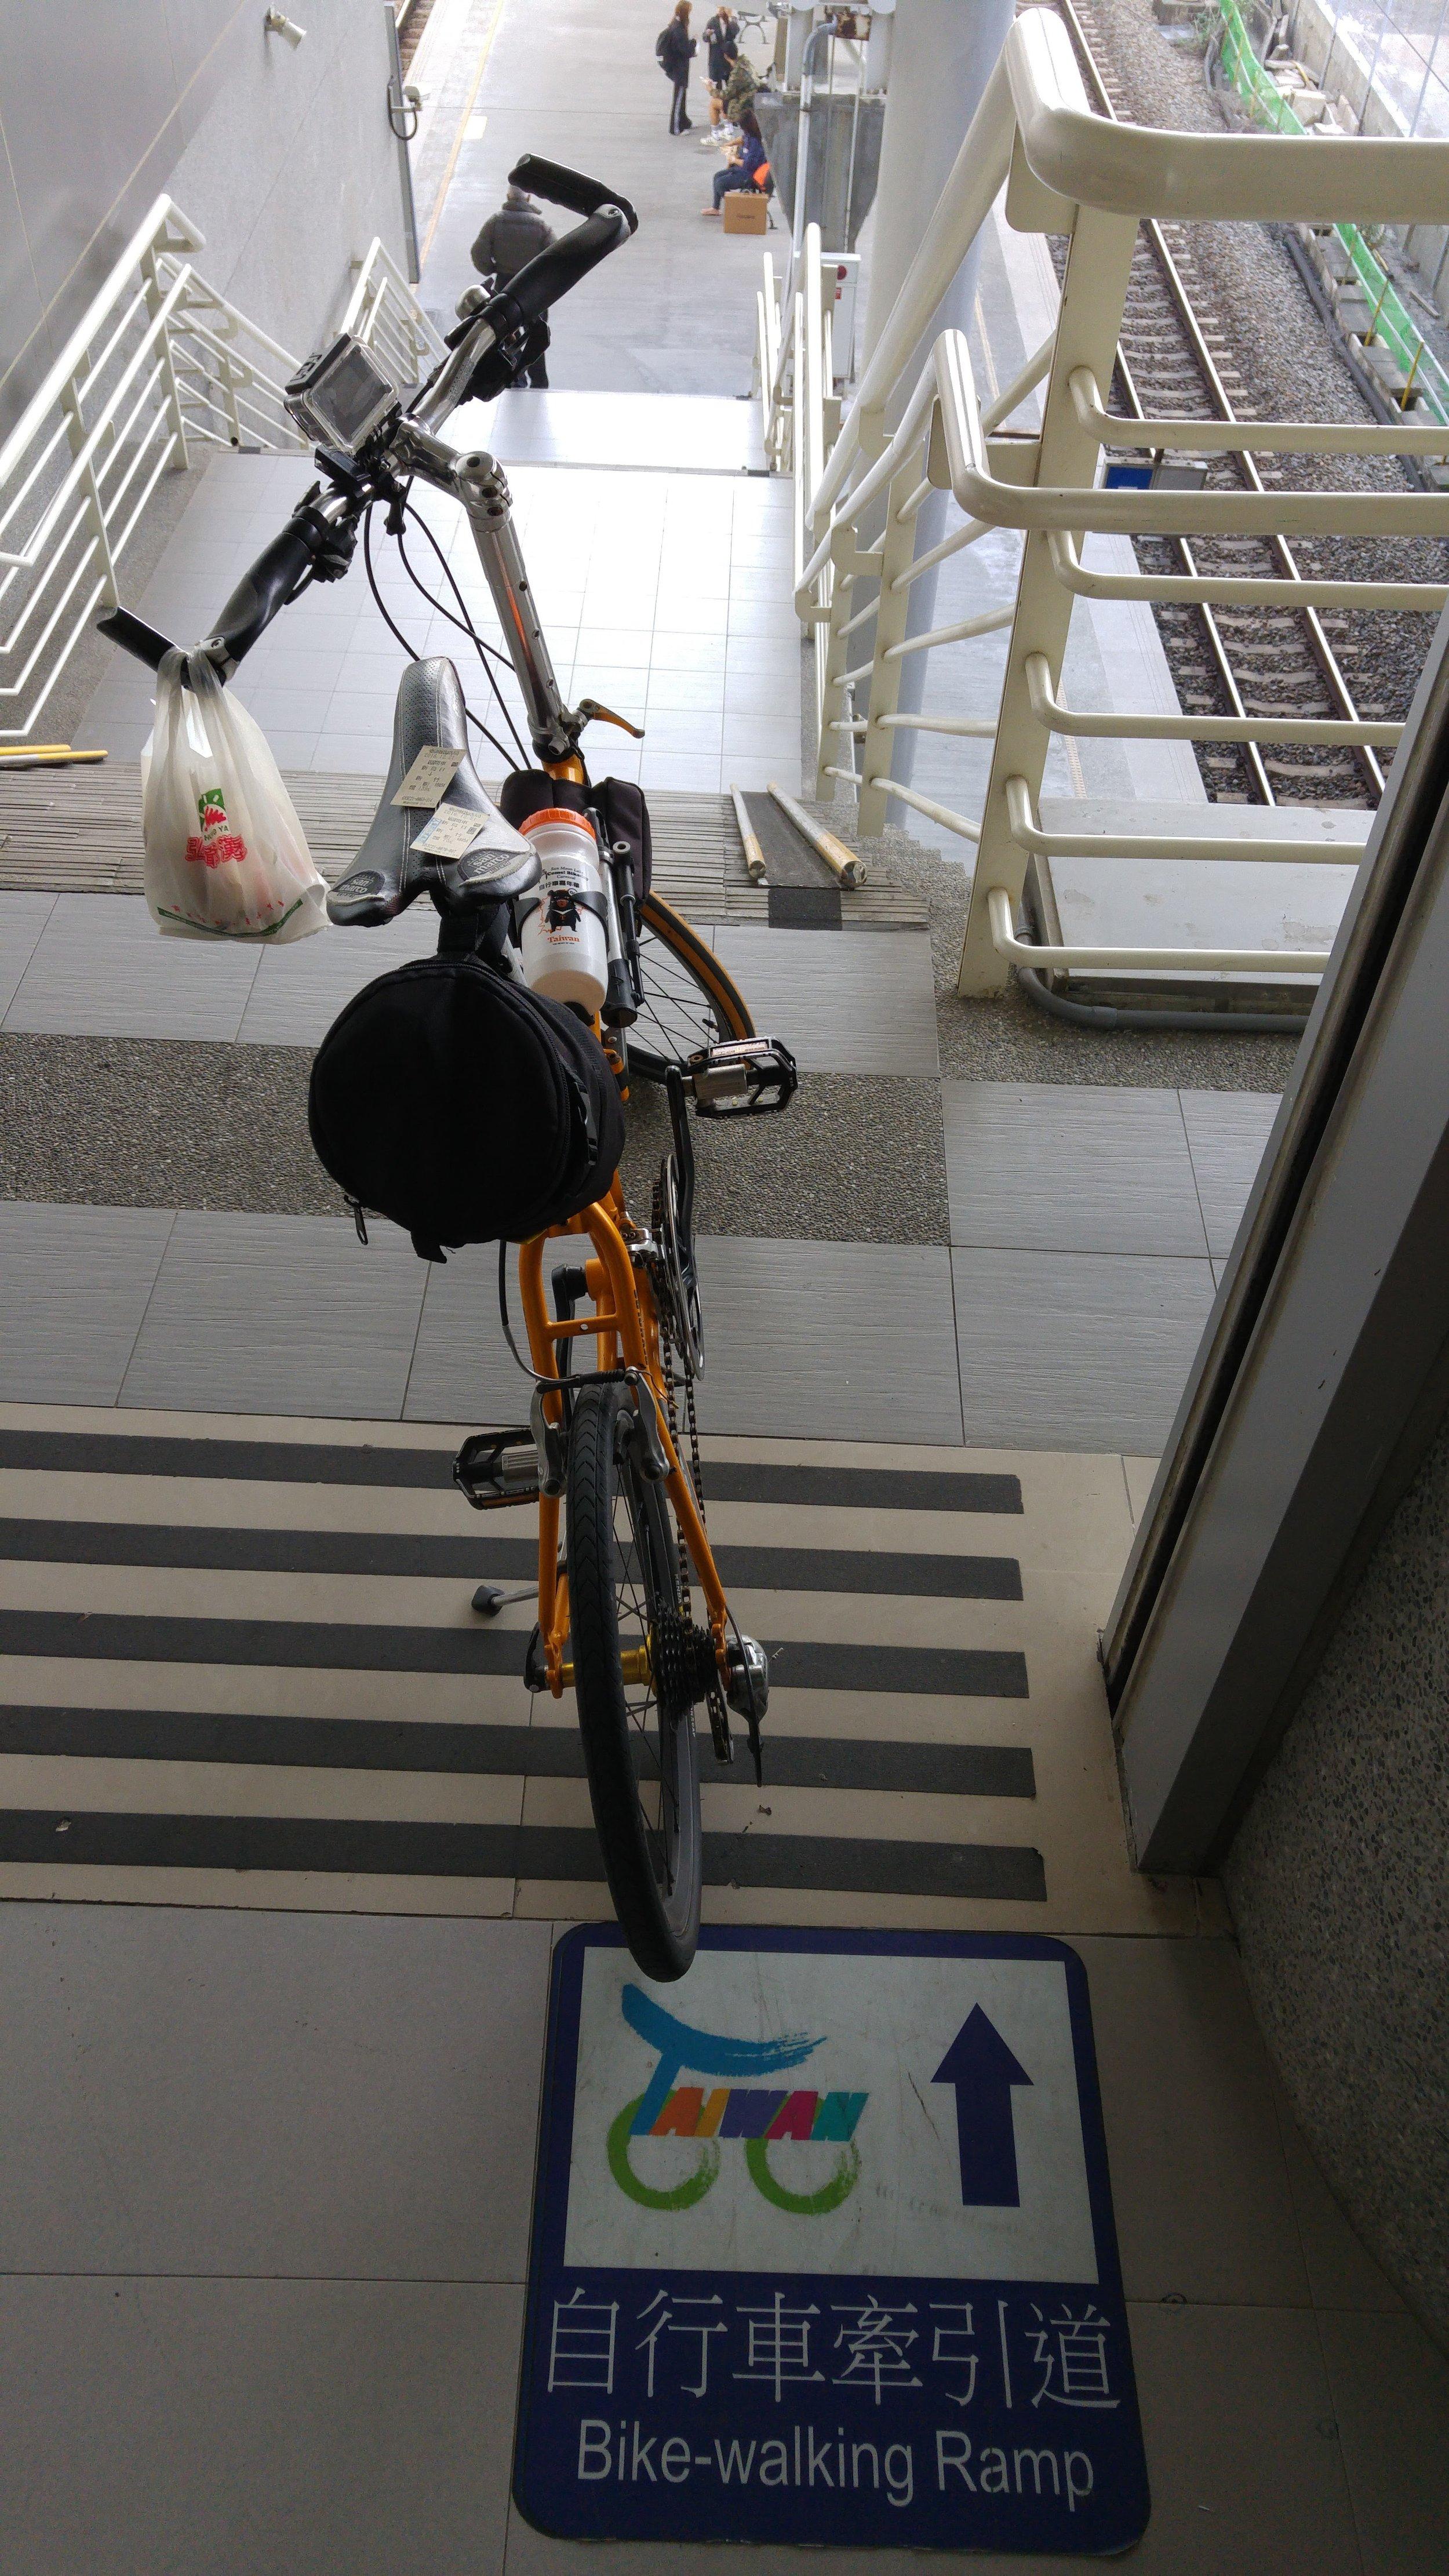 Bike-walking Ramp going downstairs